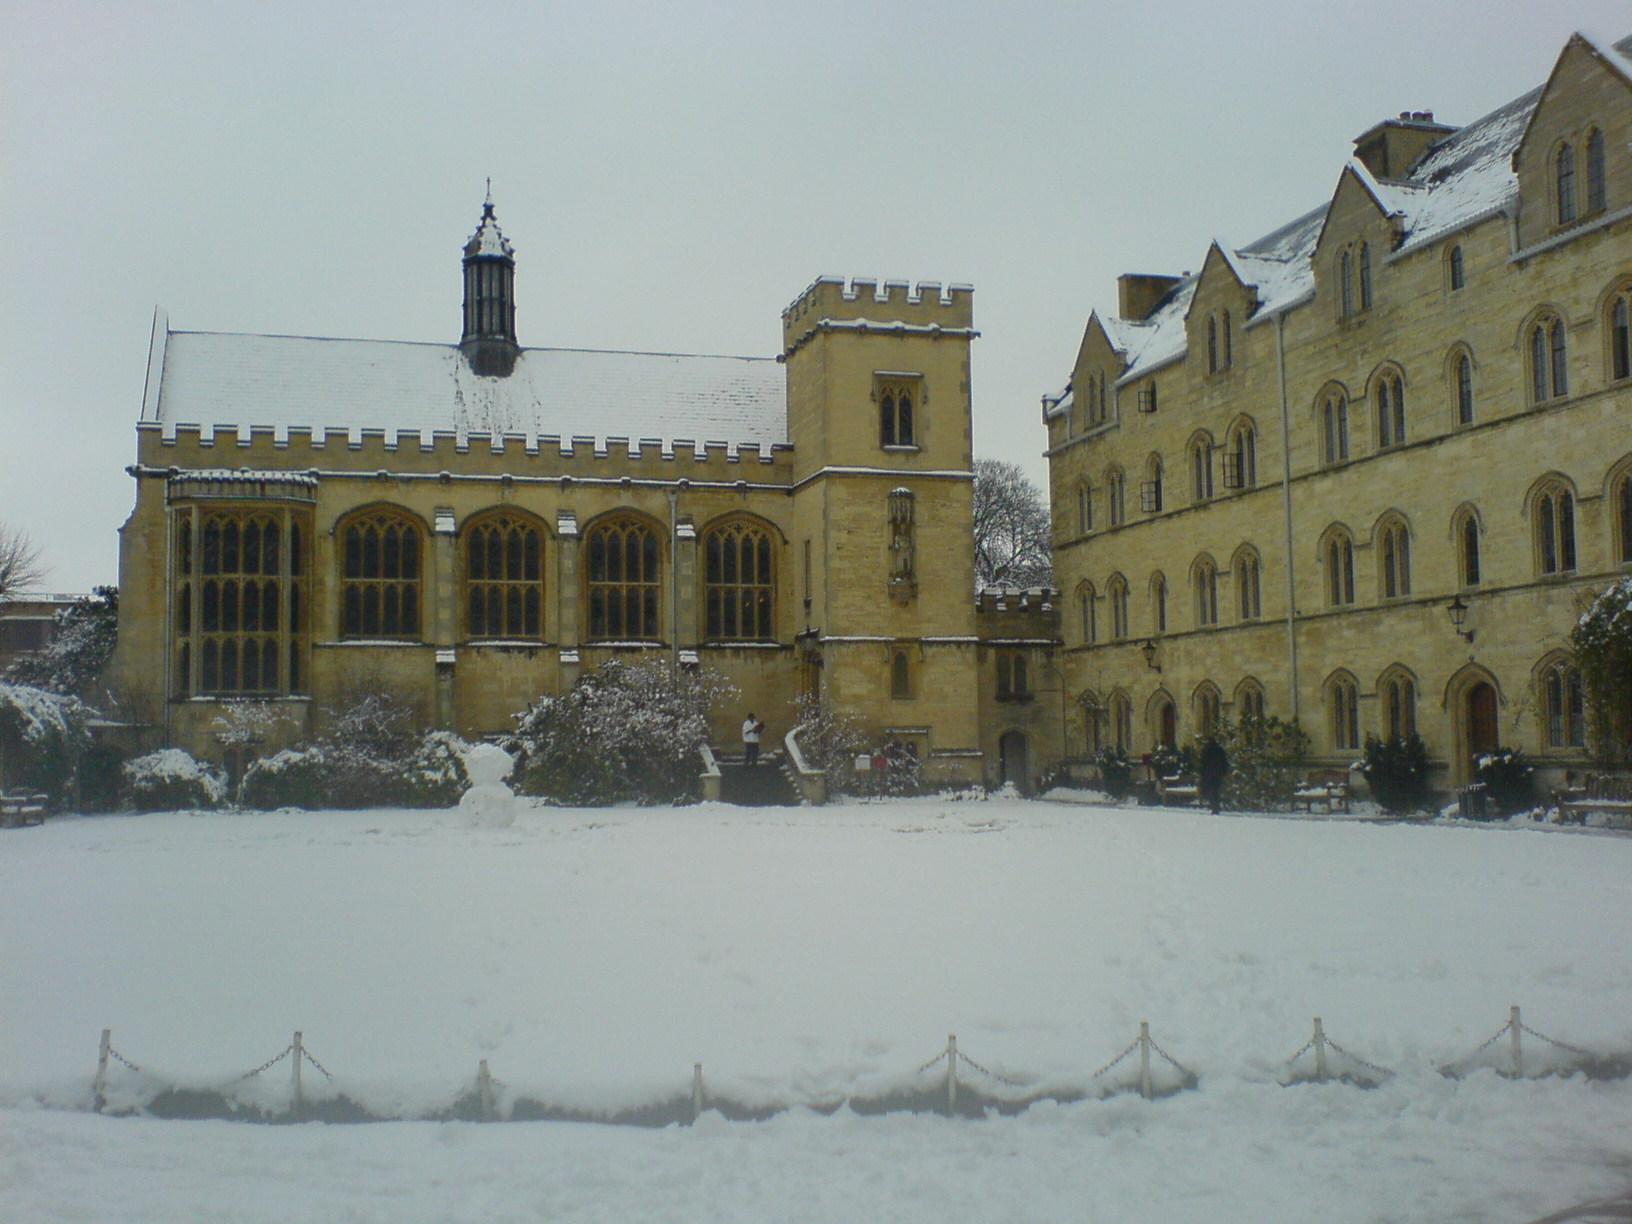 Pmb_chapelquad_snow_20070208